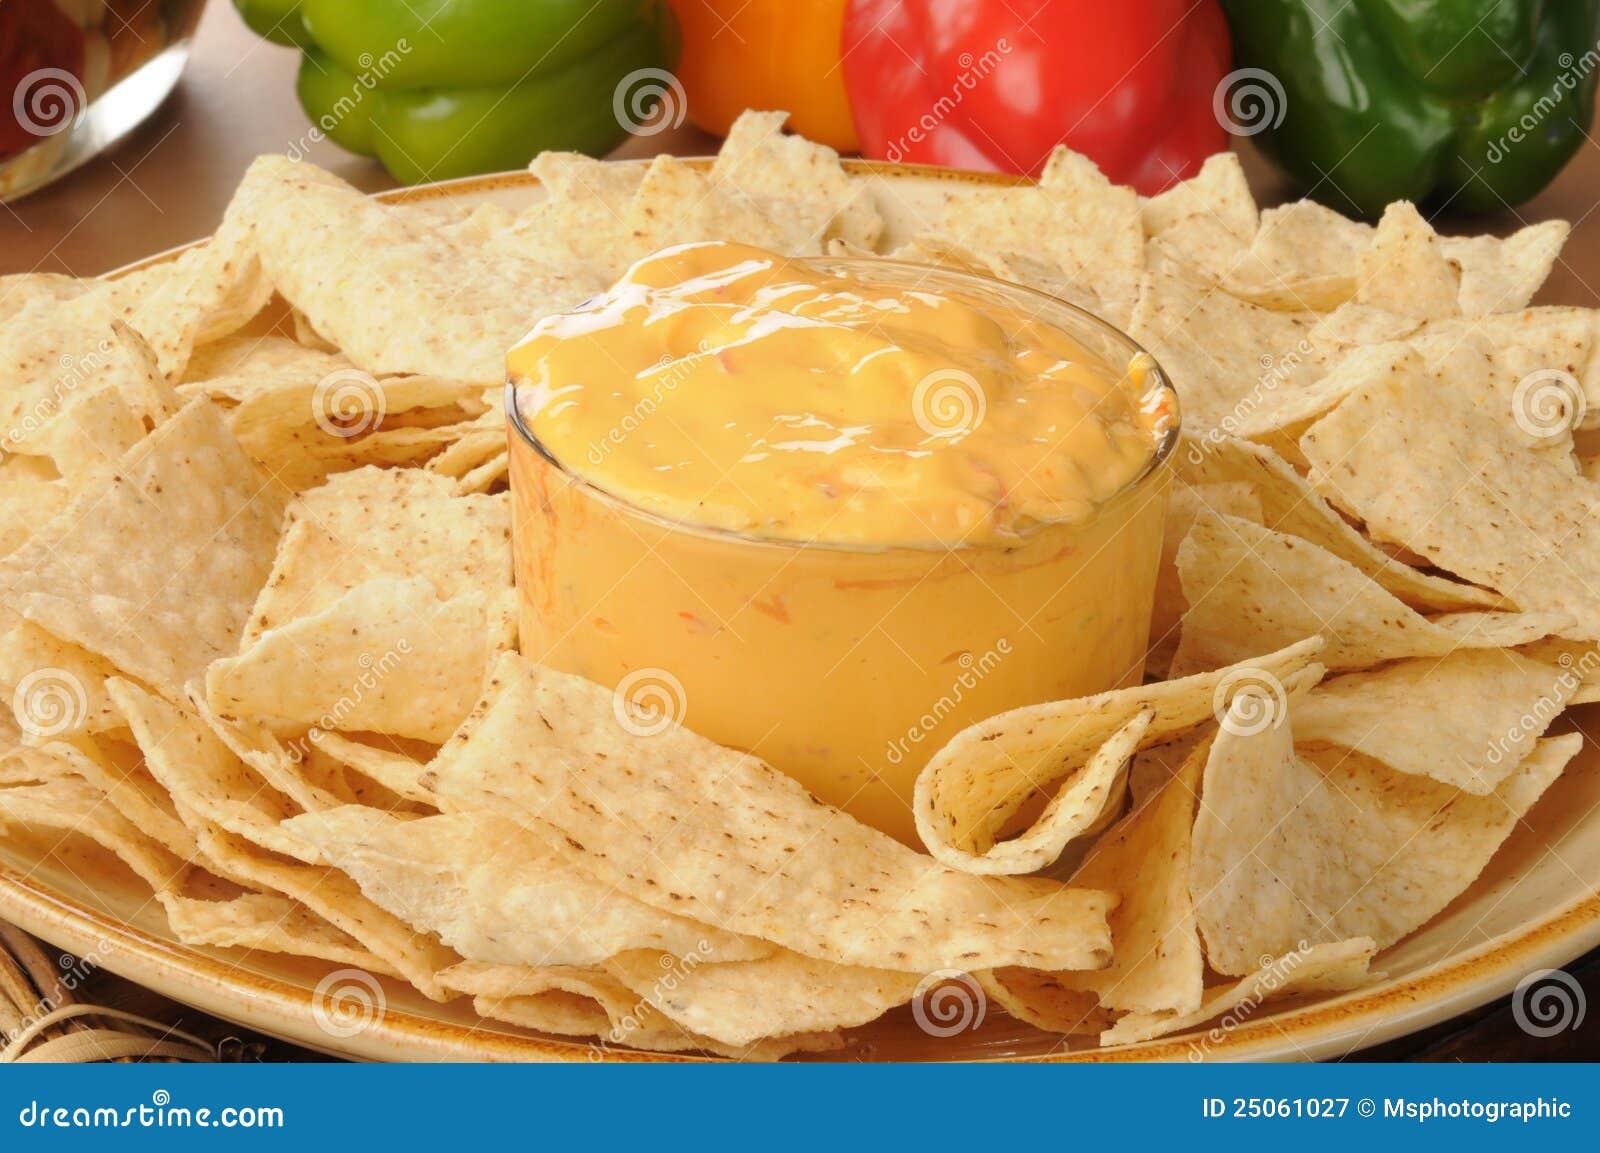 Tortillachips mit würzigem Käsedip